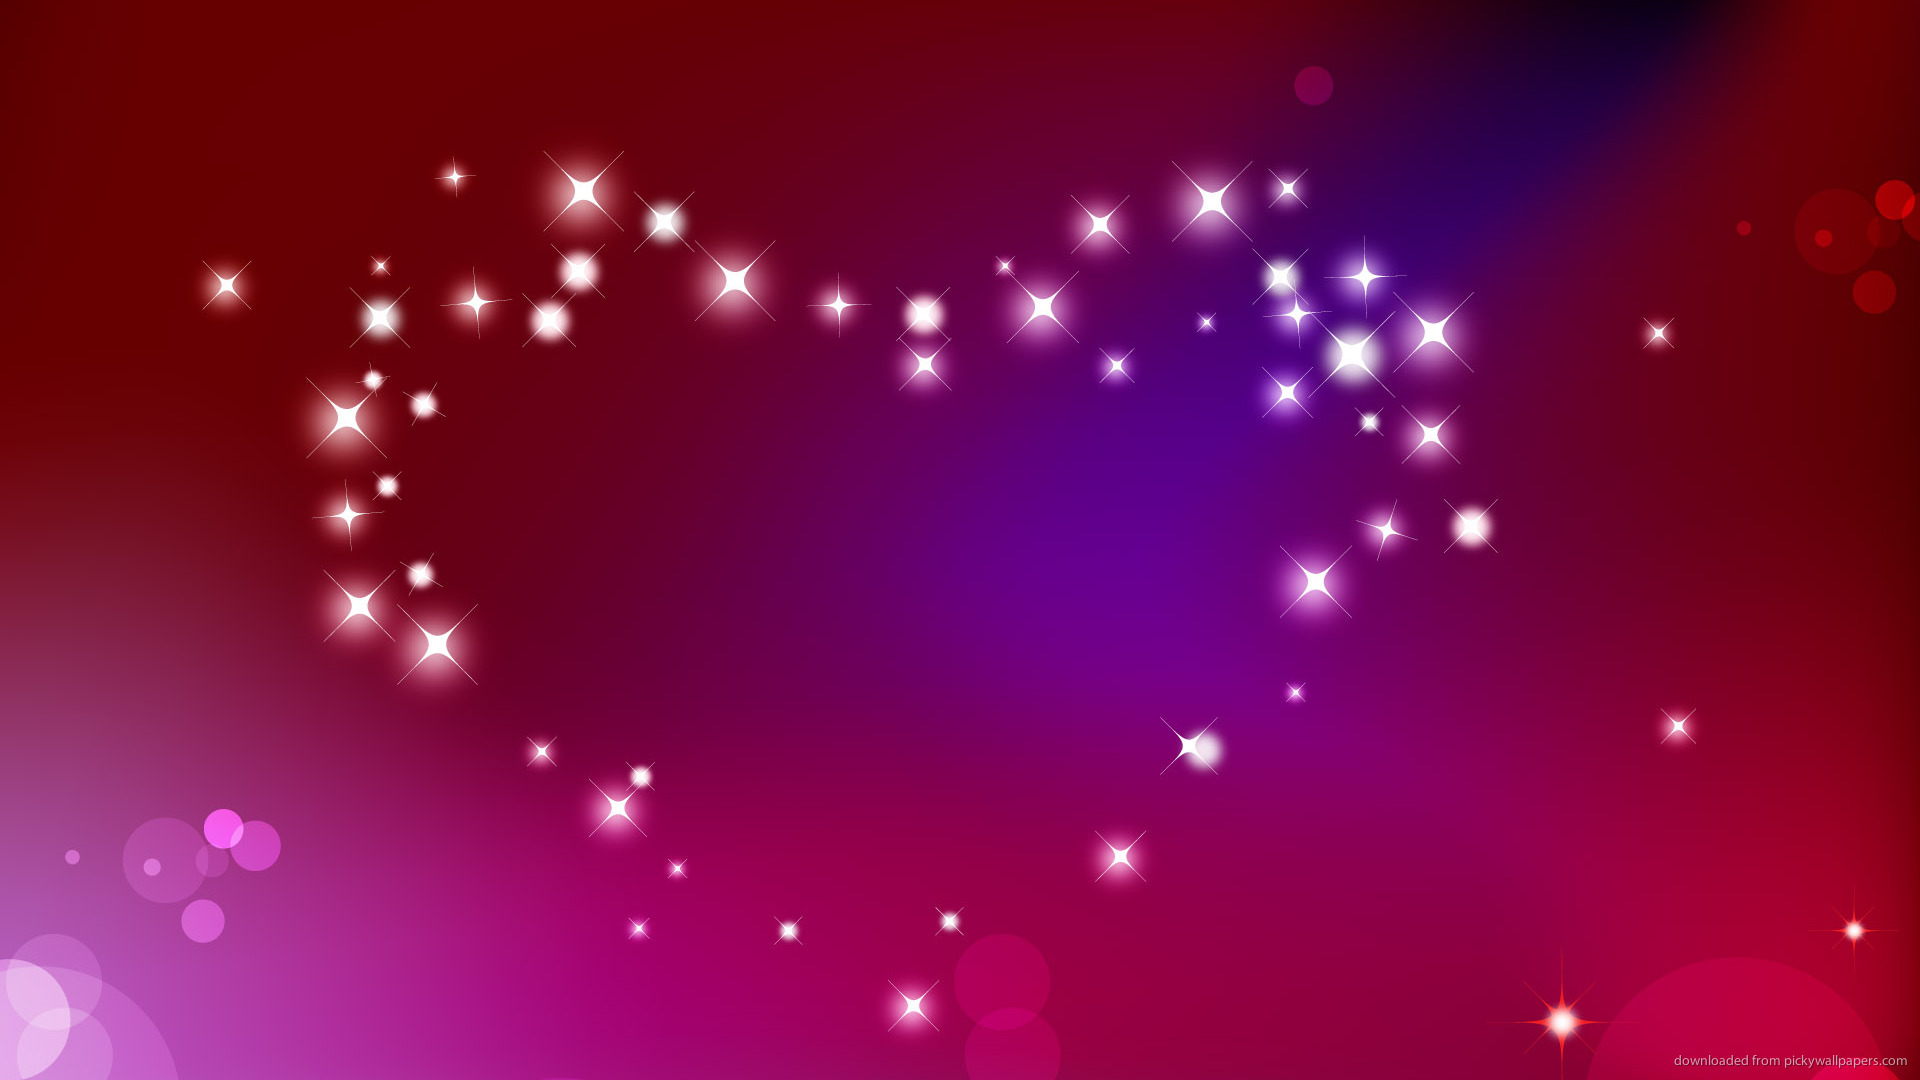 Stars and Hearts Wallpaper - WallpaperSafari